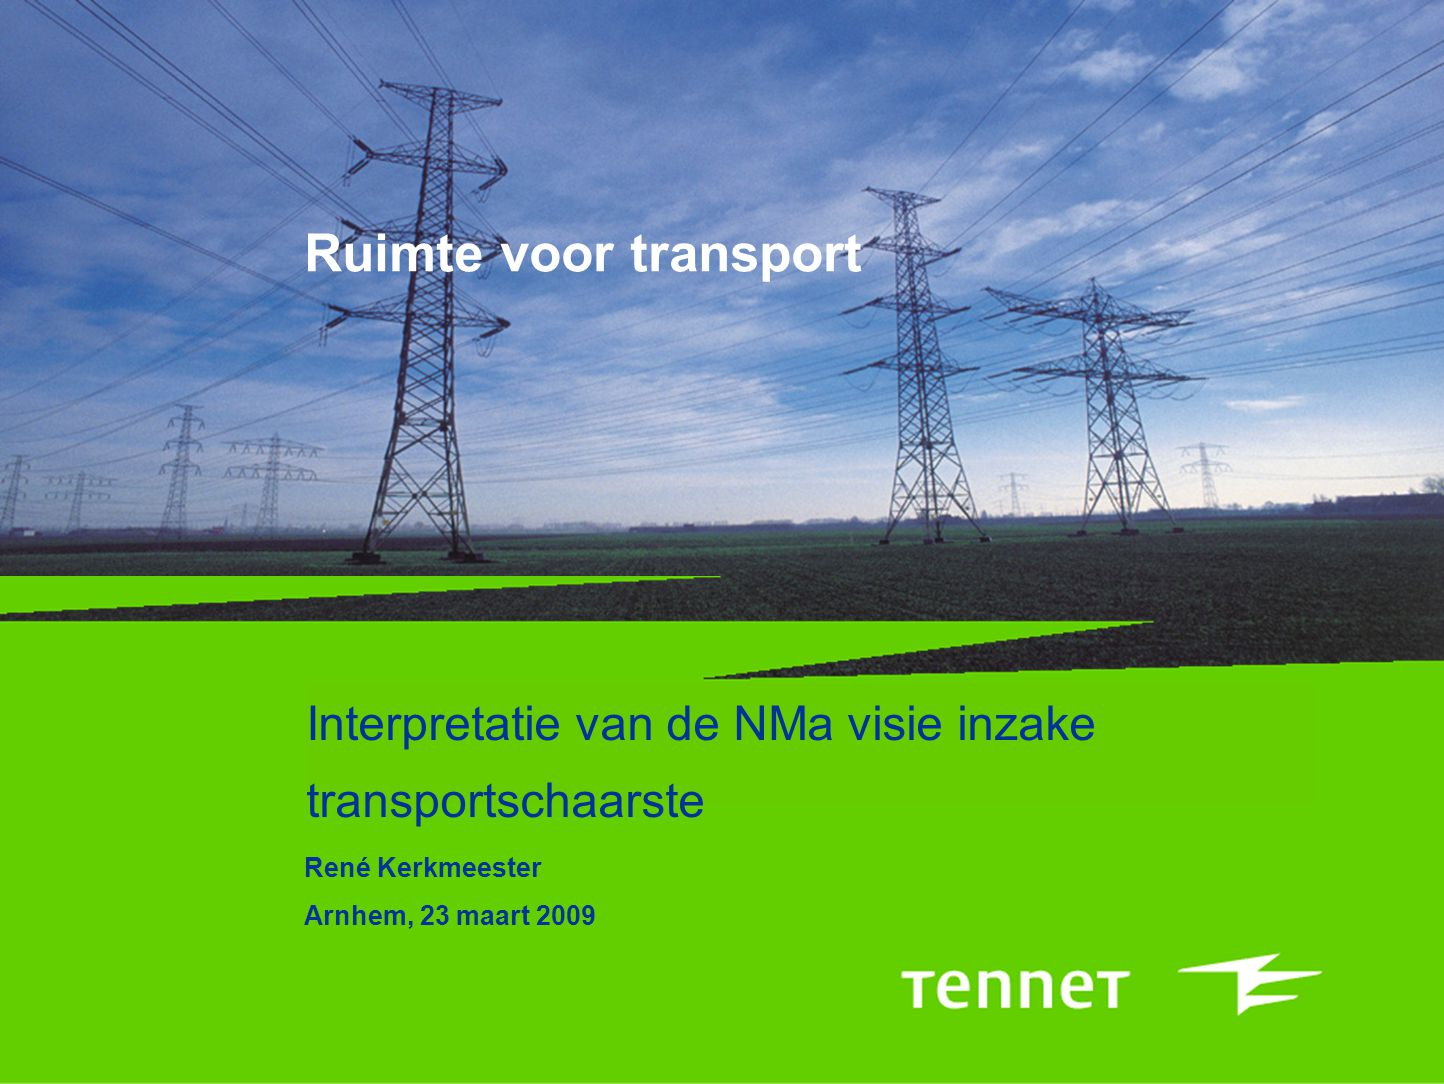 22 Netinvesteringen Zuid-Holland Sluiten Zuidring (Q2 2012) –Transportruimte: –N-2 ruimte: 5200 MW